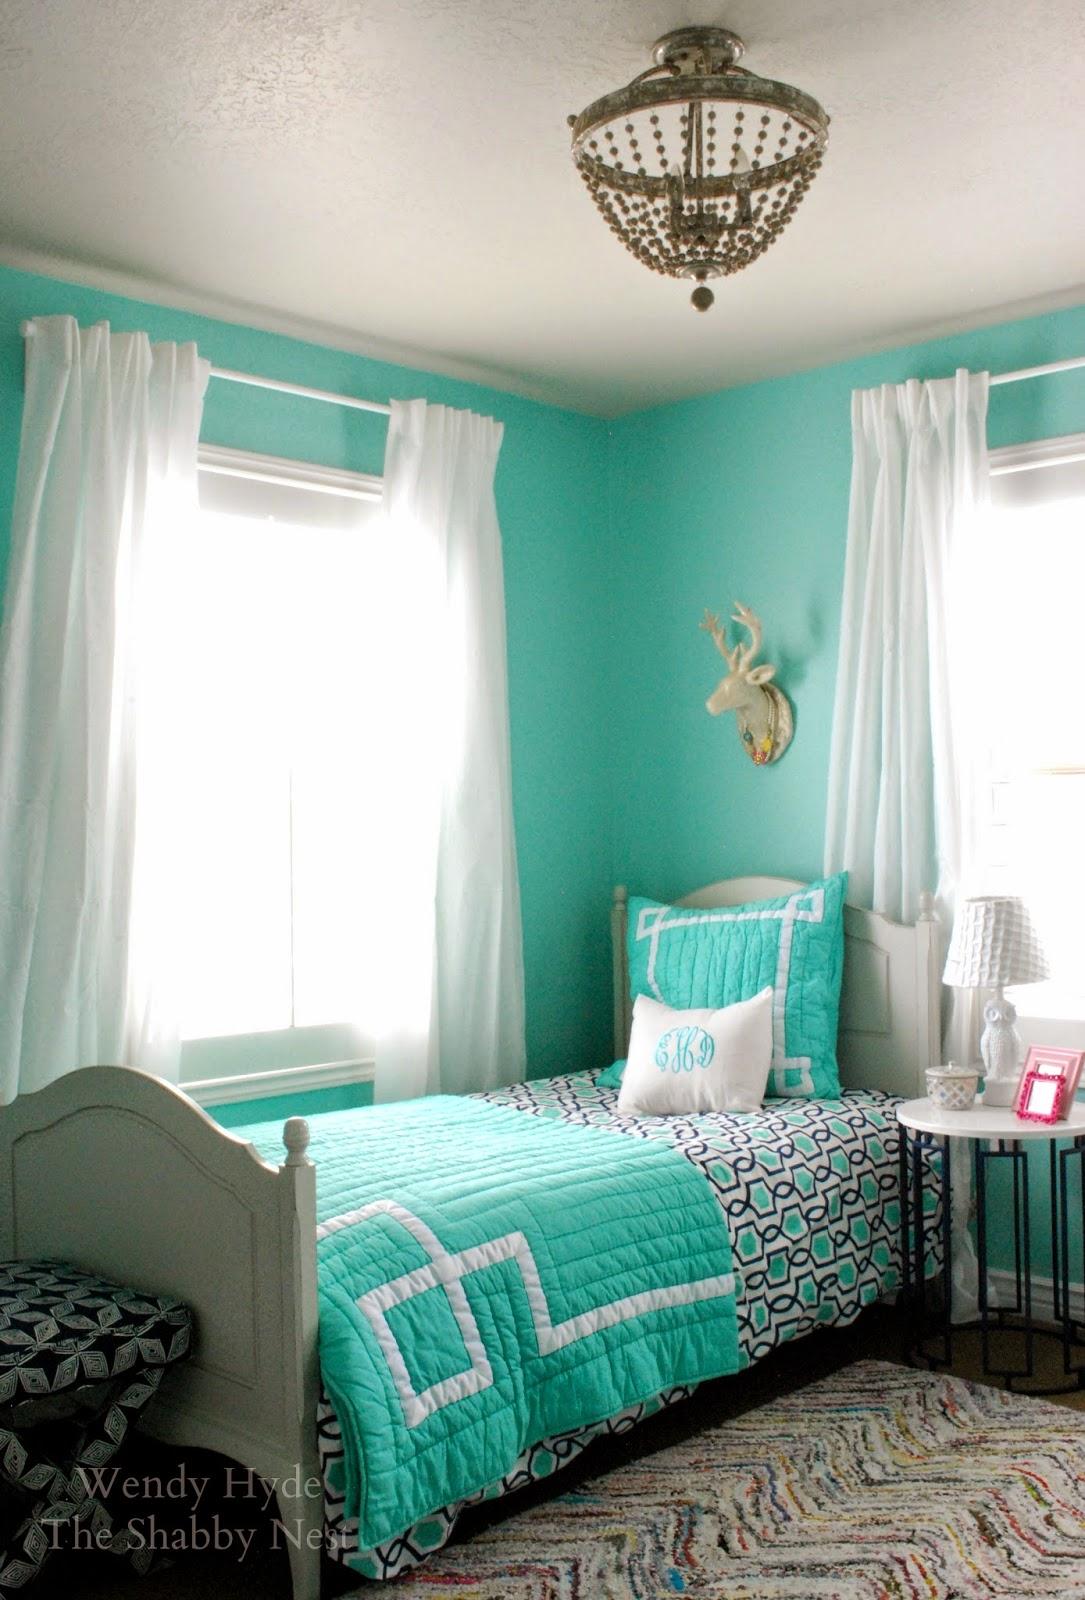 The Shabby Nest One Room Challenge The Teen Girls Bedroom REVEAL